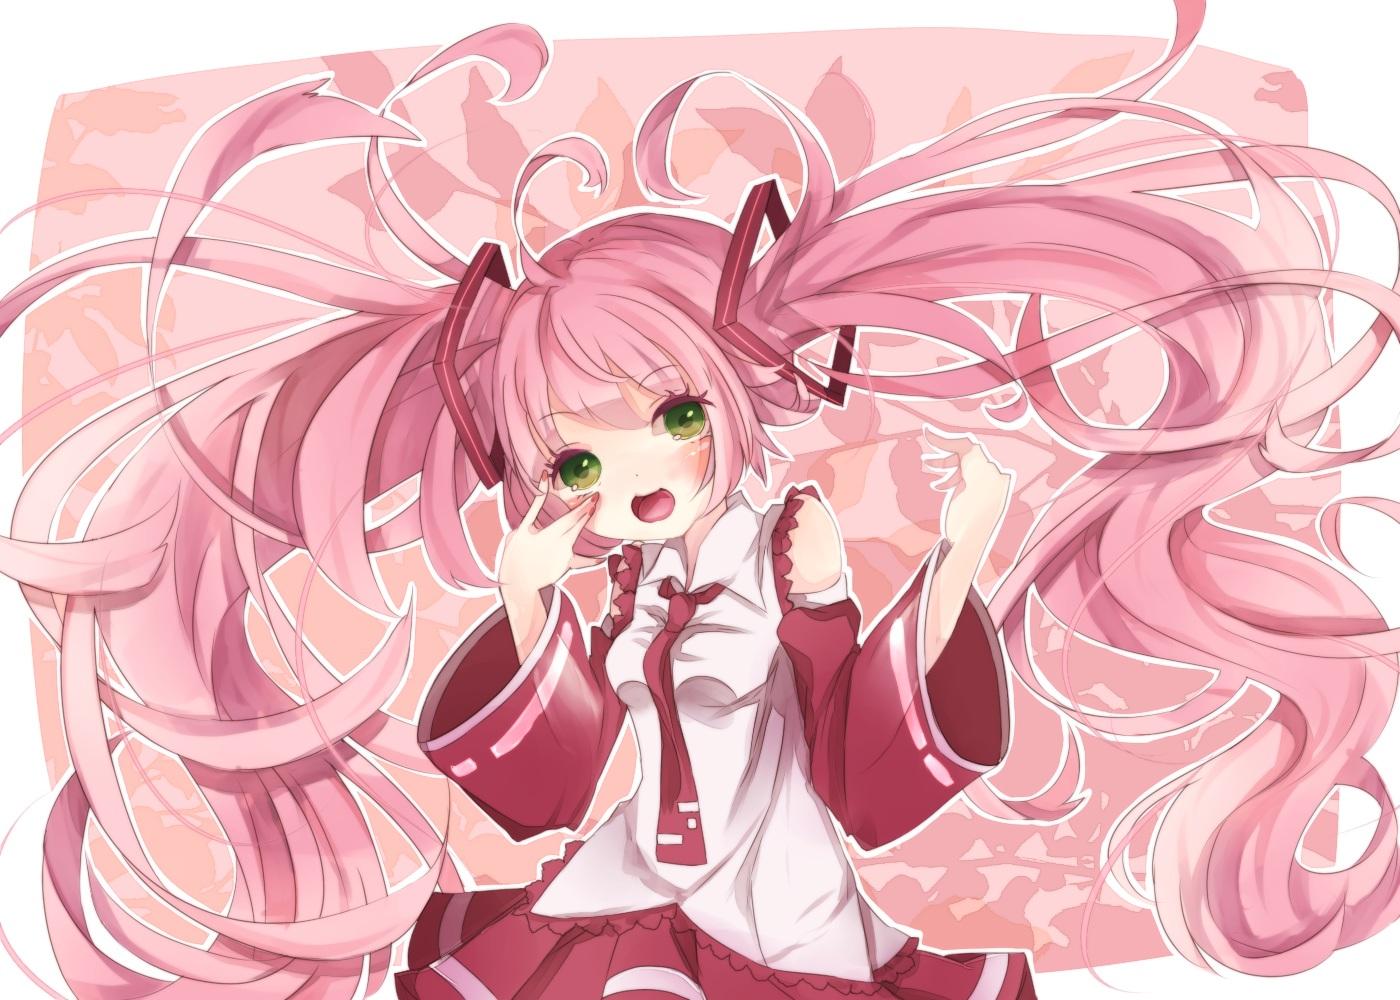 blush green_eyes hatsune_miku long_hair motsuni_(lxxe1120) pink_hair sakura_miku tie twintails vocaloid